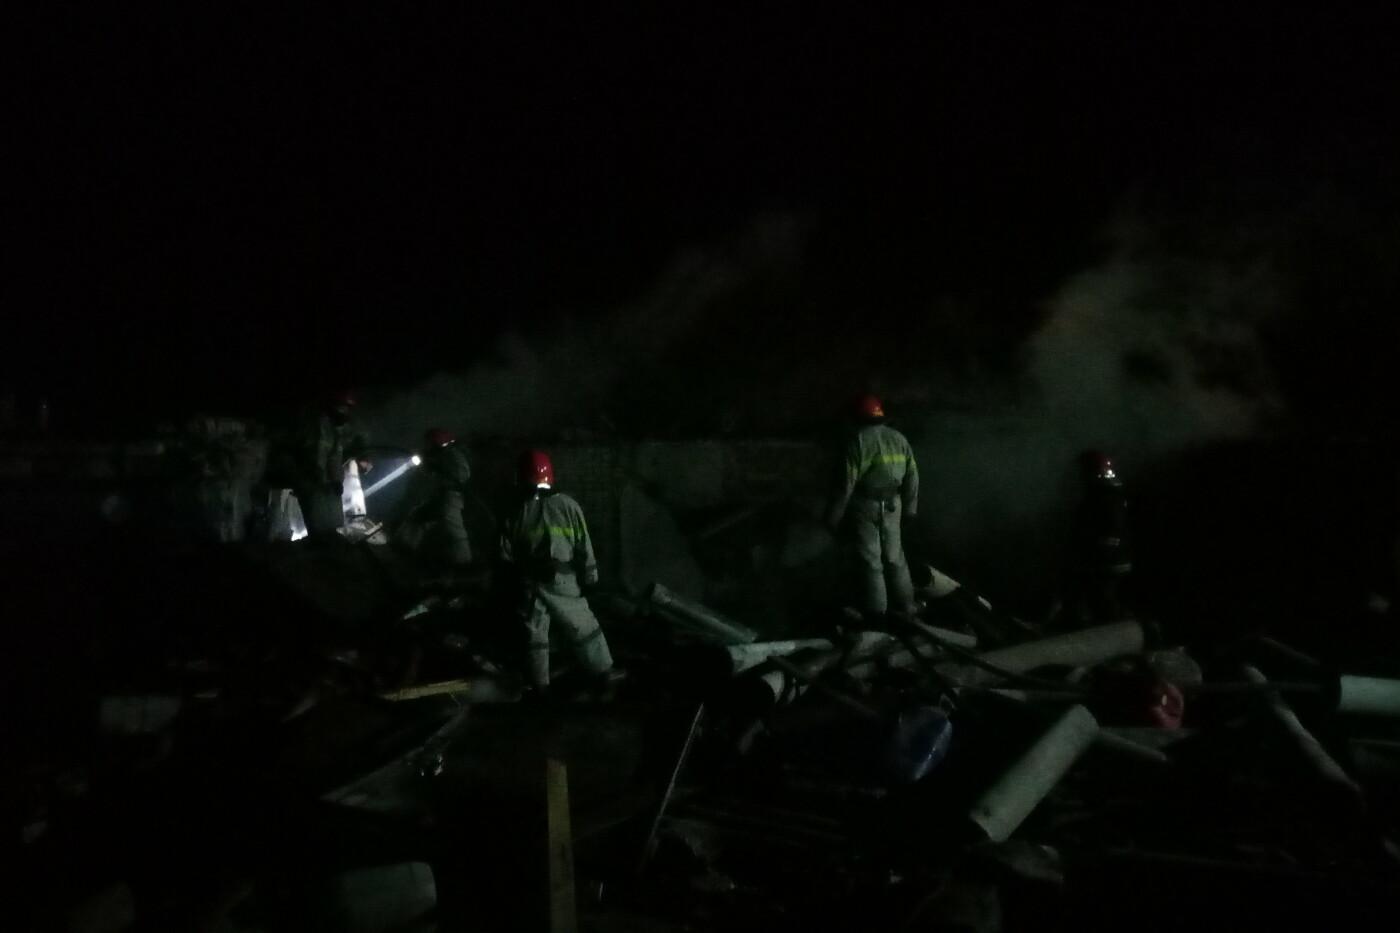 На Харьковщине из-за поджога гаражного кооператива произошел взрыв, - ФОТО, фото-3